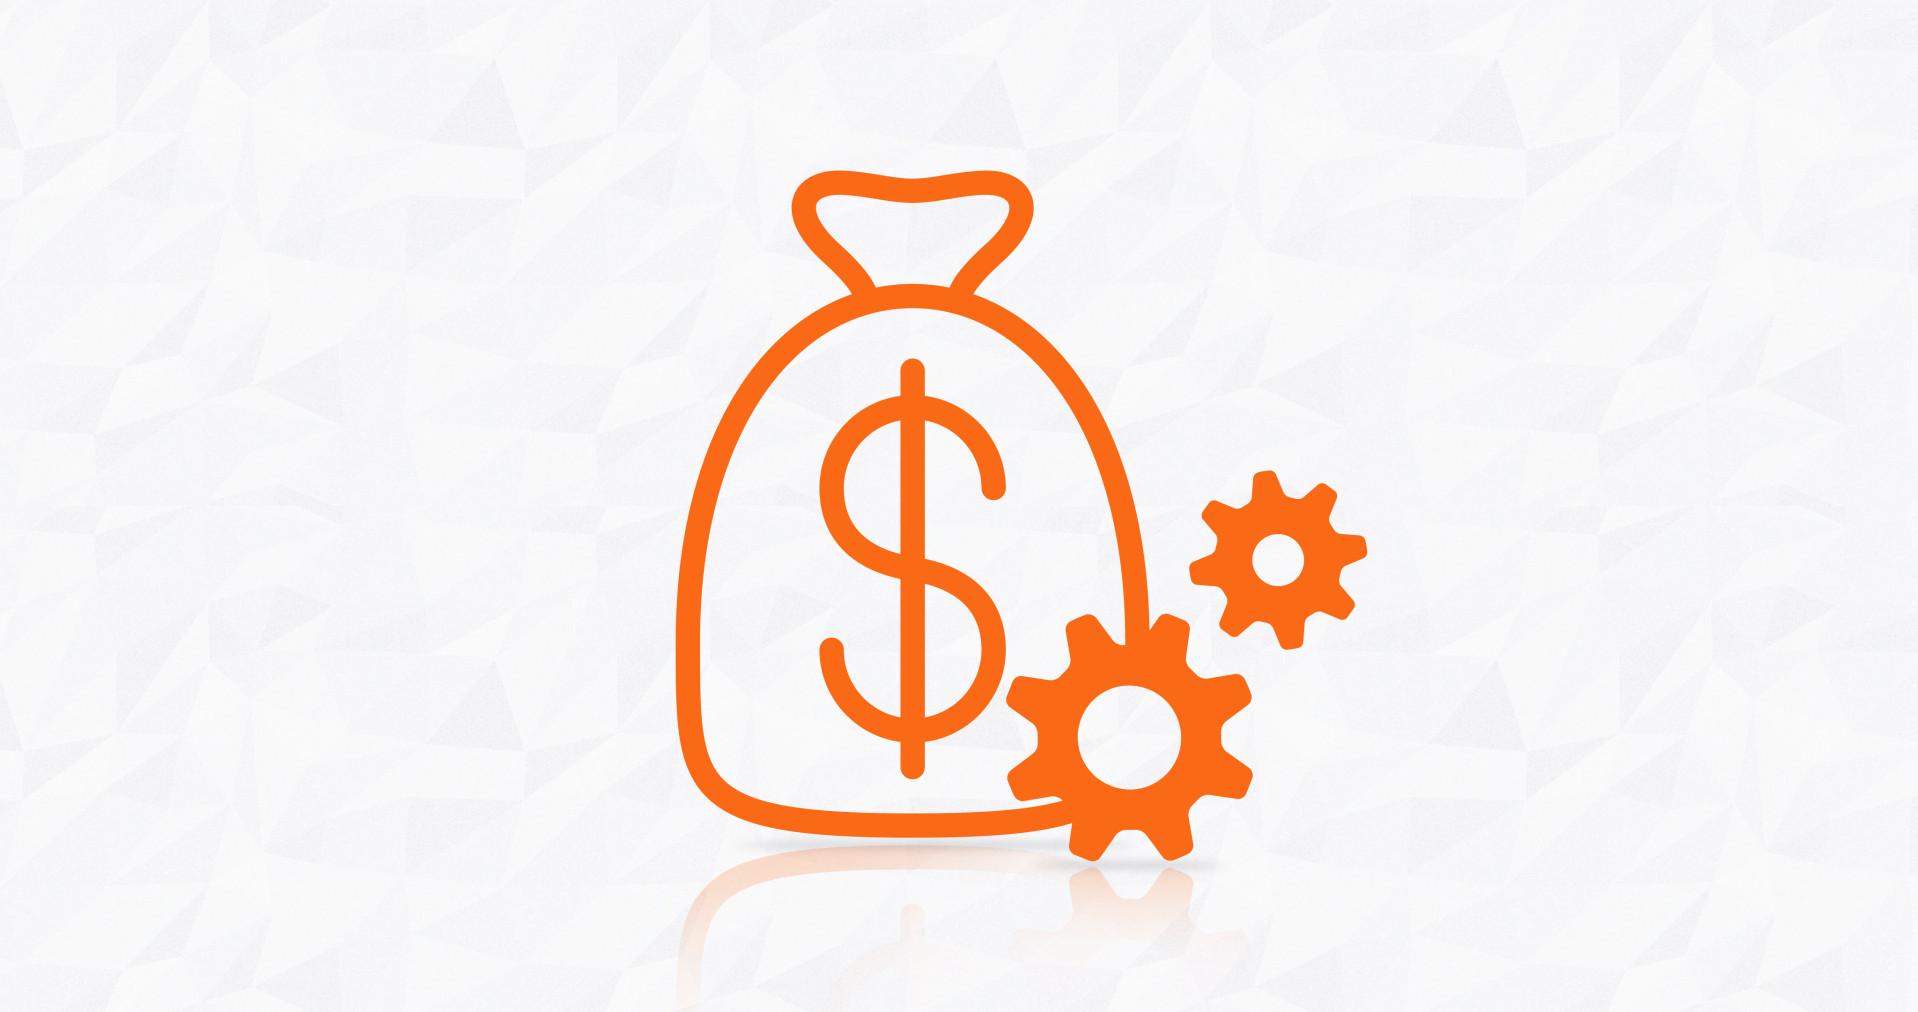 /products/Vehicles/Financing/Basic_Dynamic/images/STILL_Grafikproduktion_Finanzierungsloesungen_Basic-Dynamic_4K.jpg